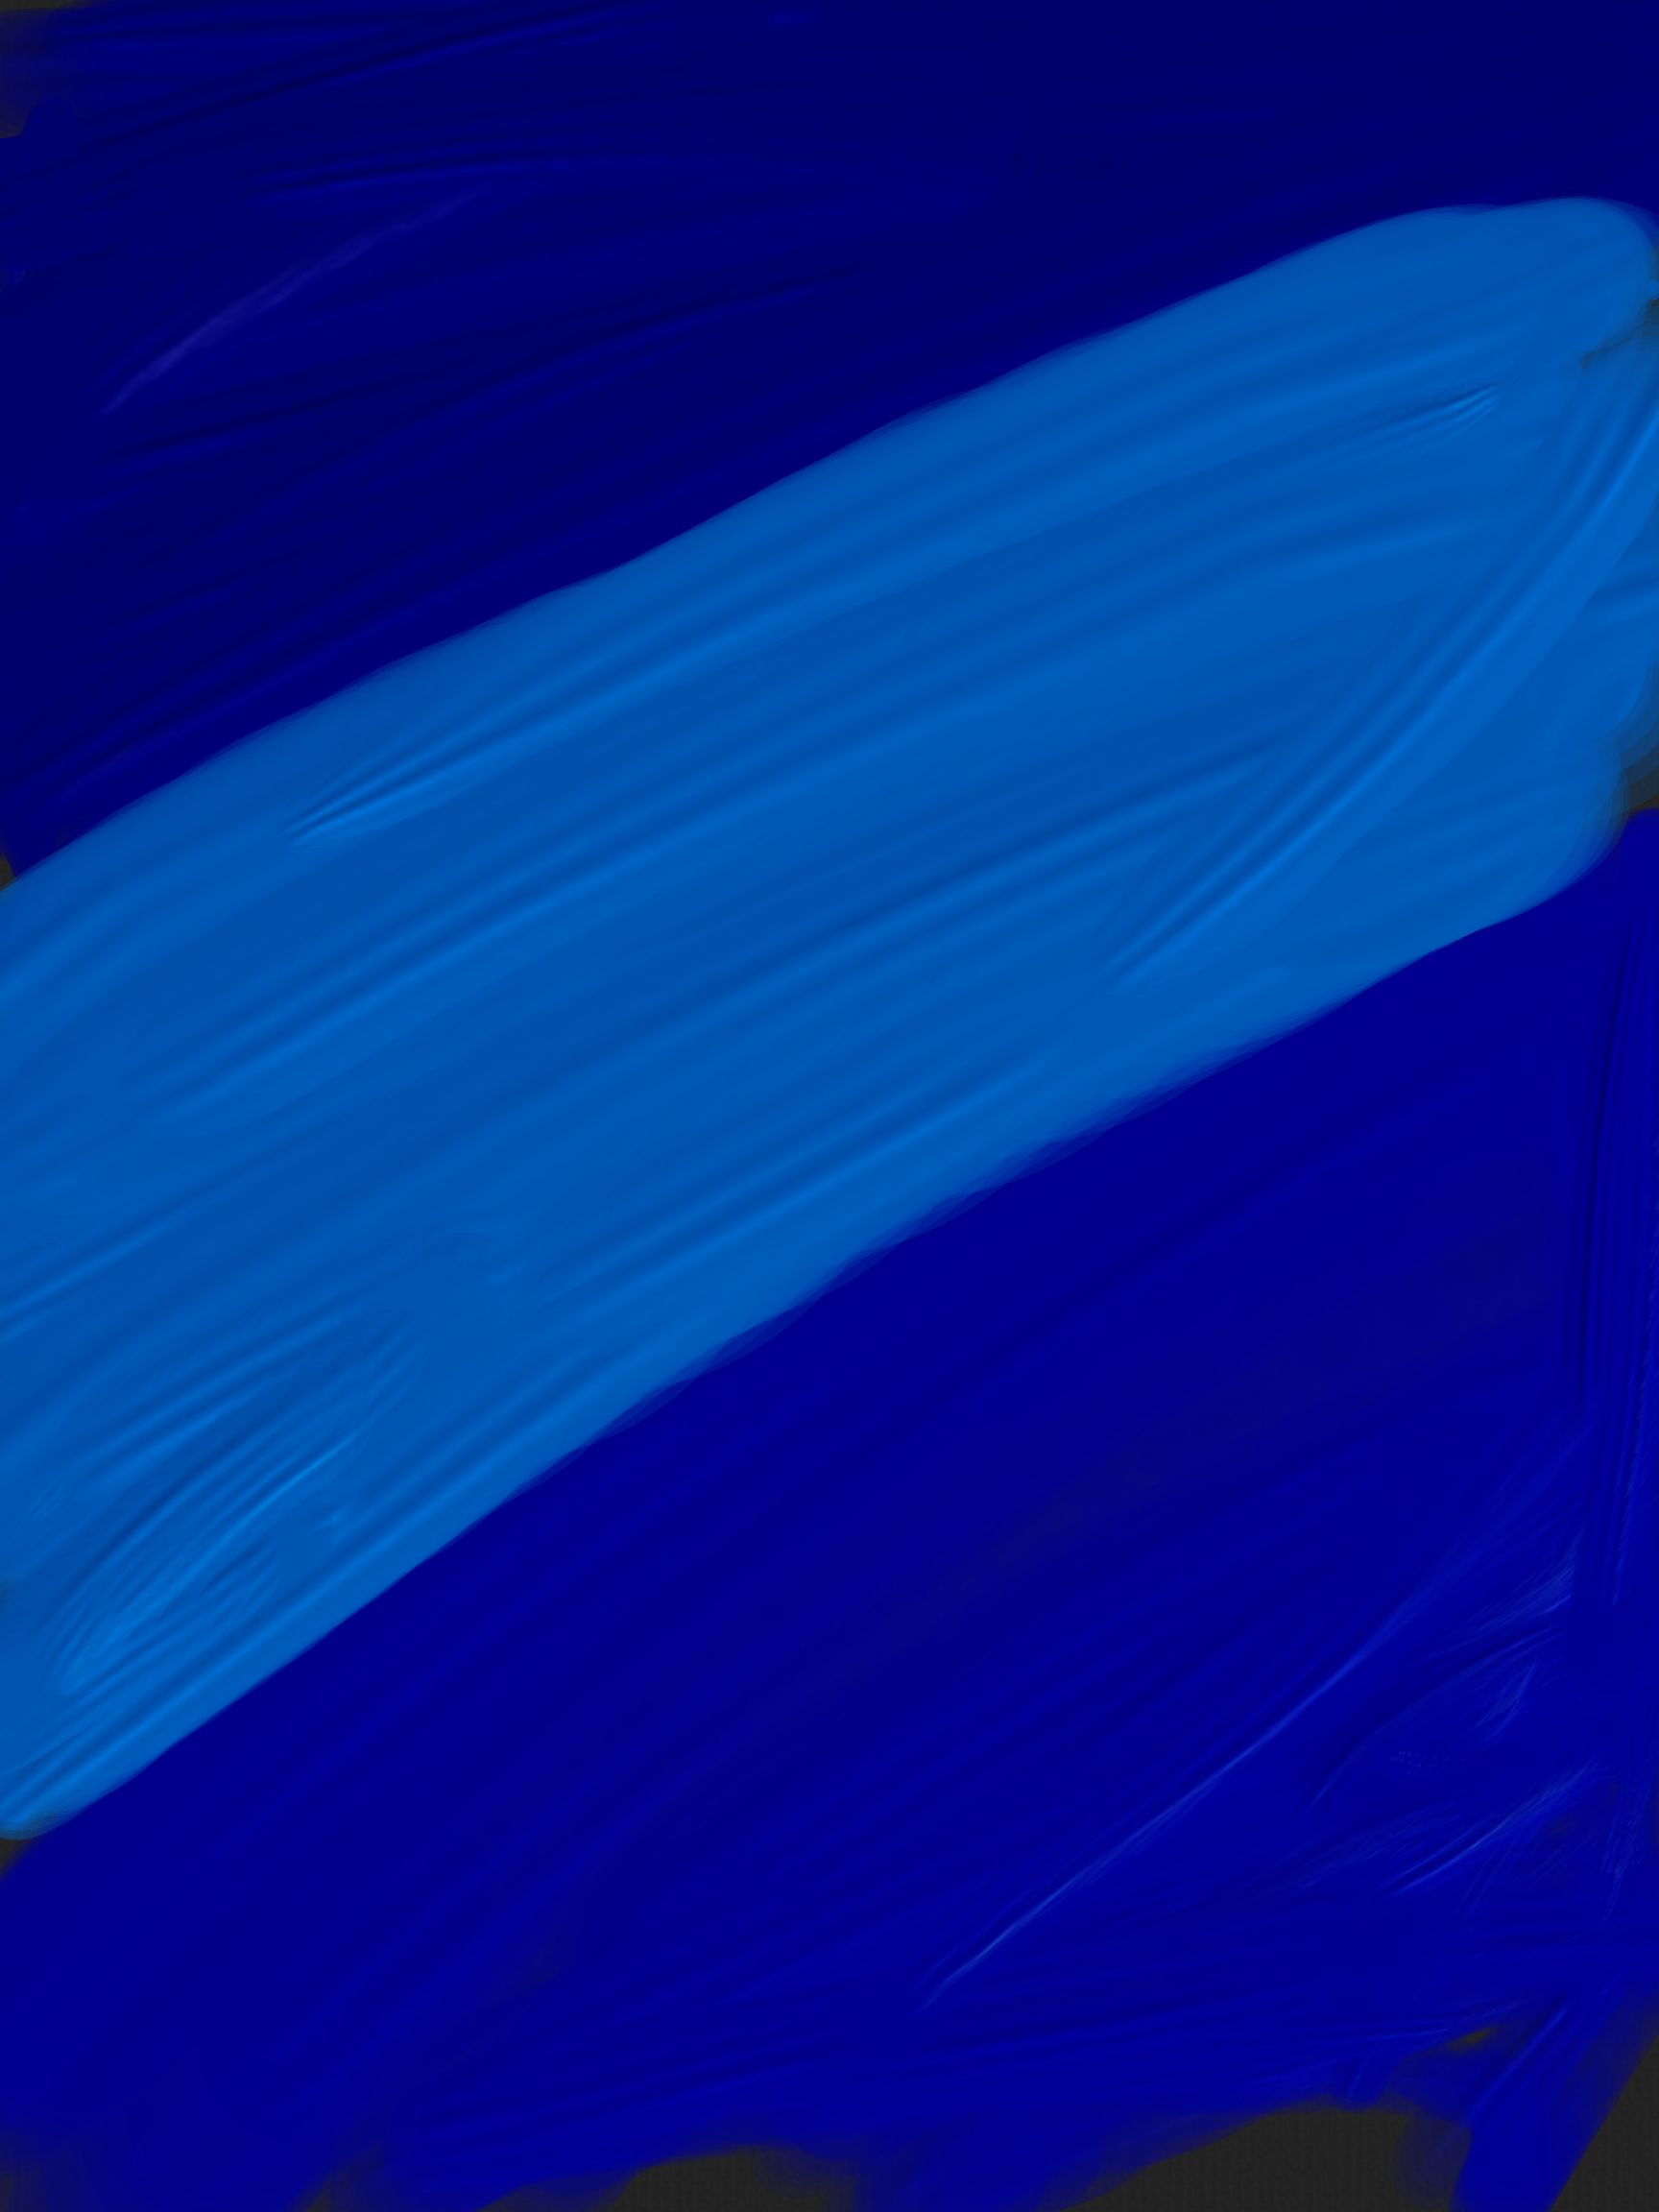 My creation in Art Set on my iPad http://appstore.com/artset